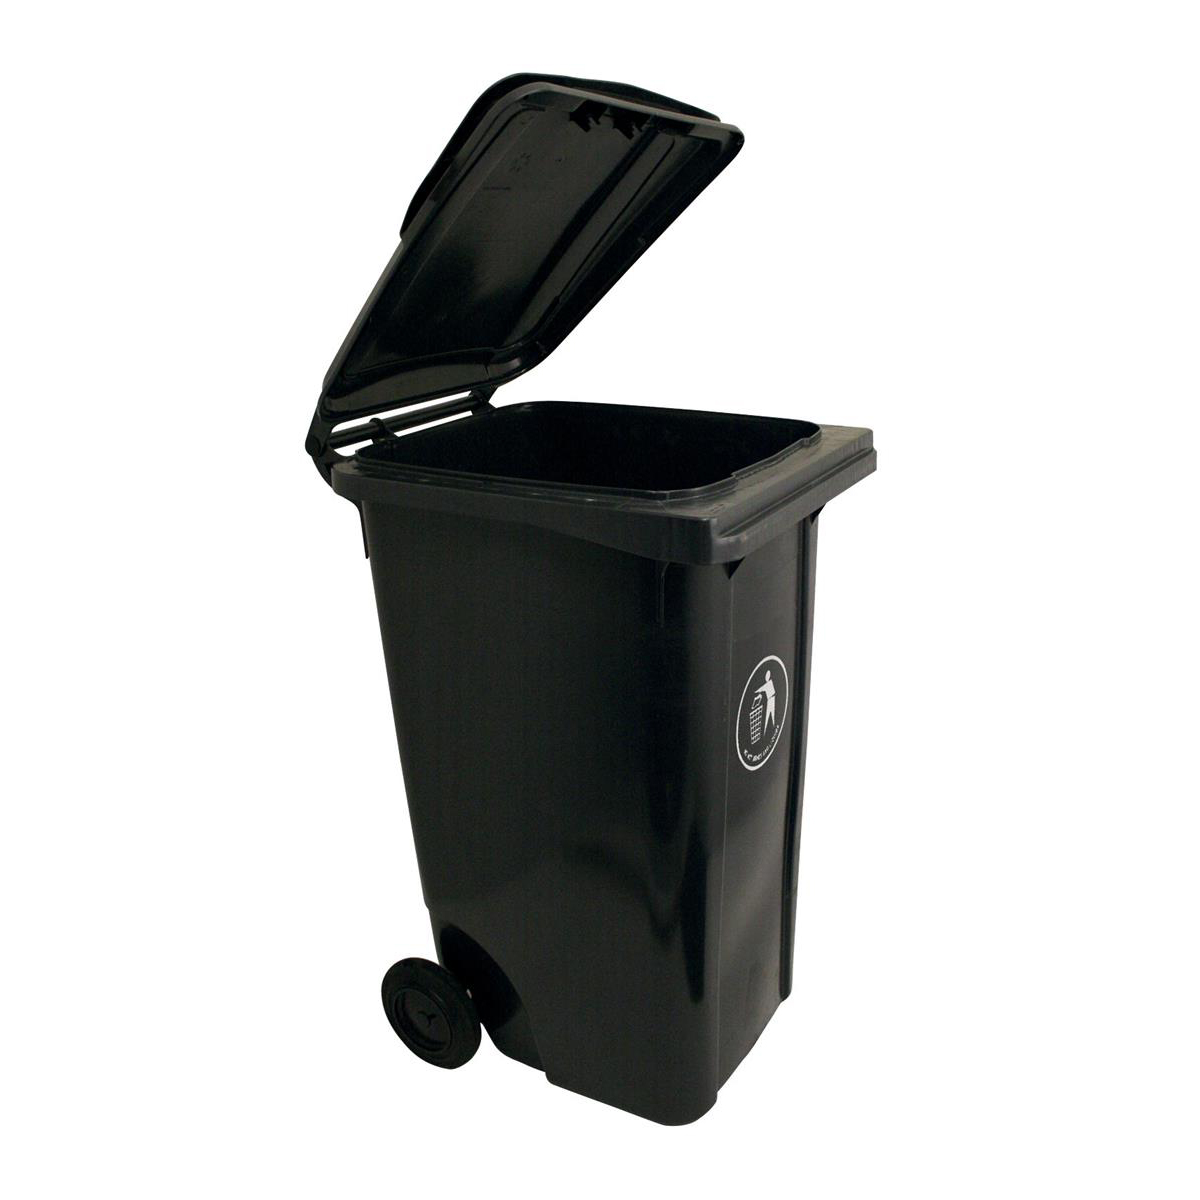 Wheelie Bin High Density Polyethylene with Rear Wheels 120 Litre Capacity 480x560x930mm Grey